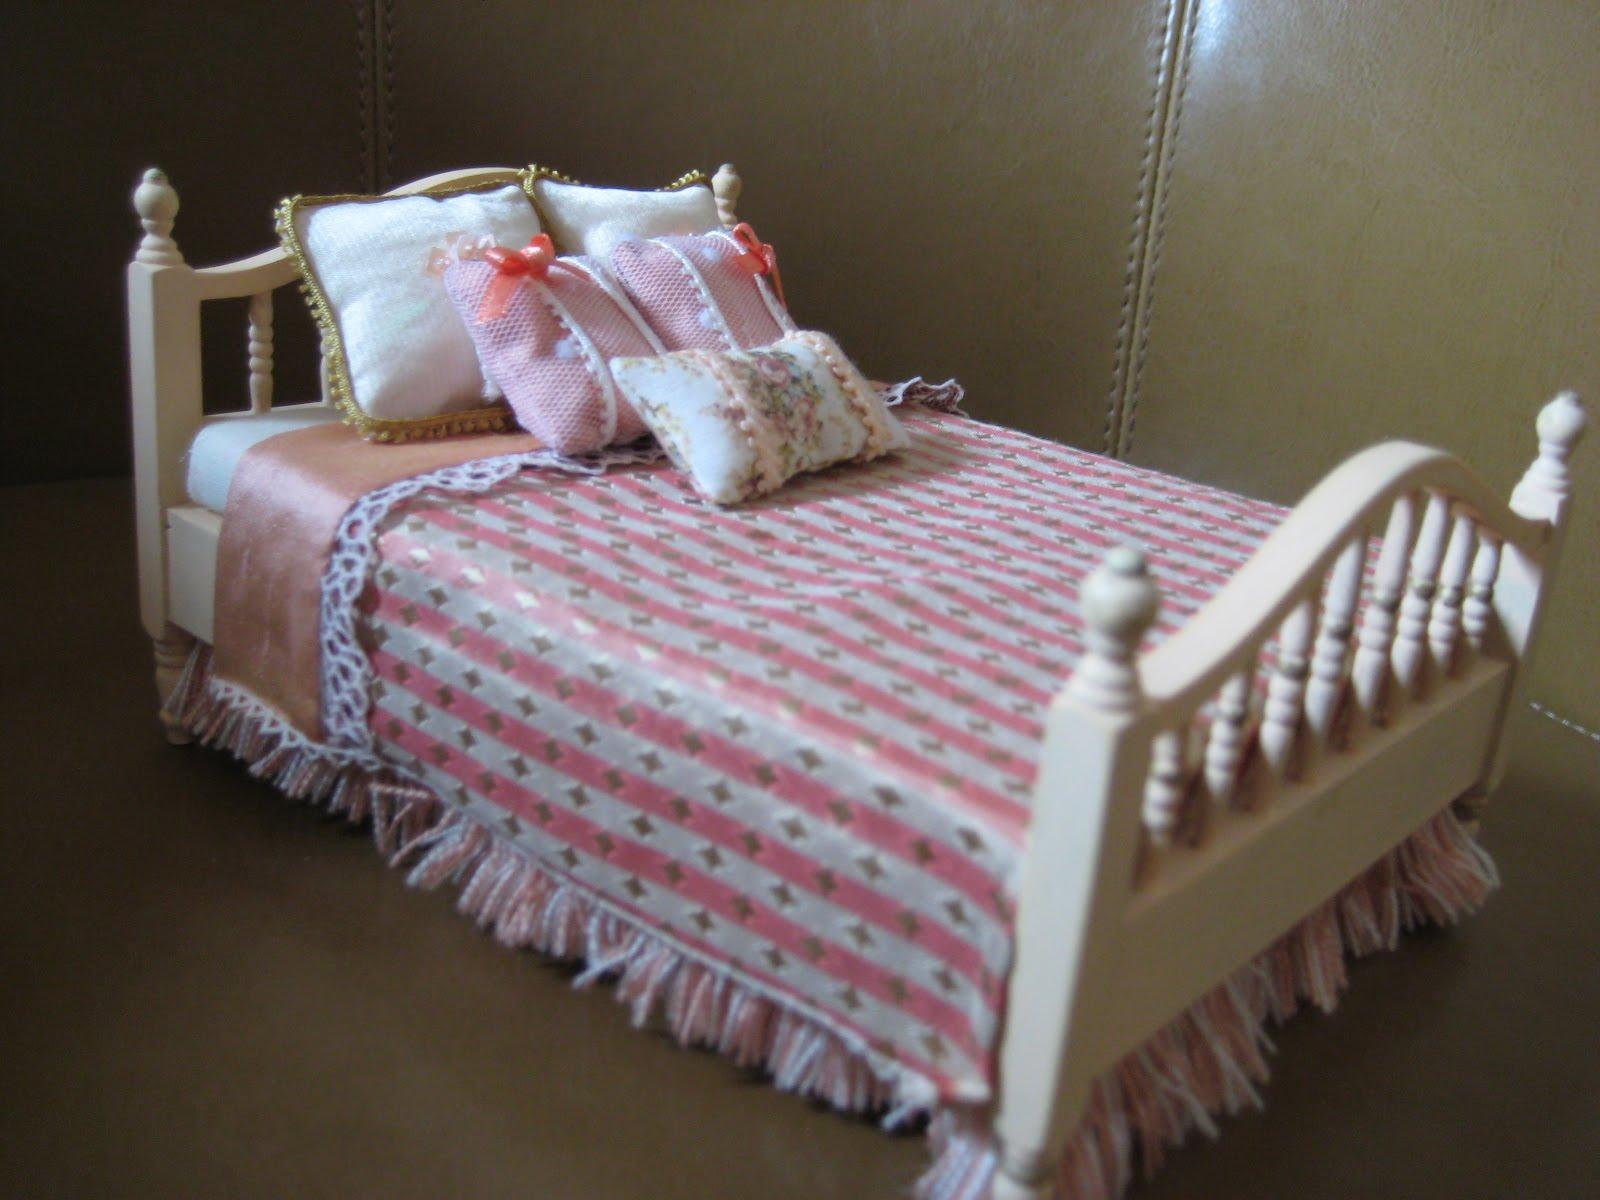 La casita encantada camas decoradas - Camas decoradas ...